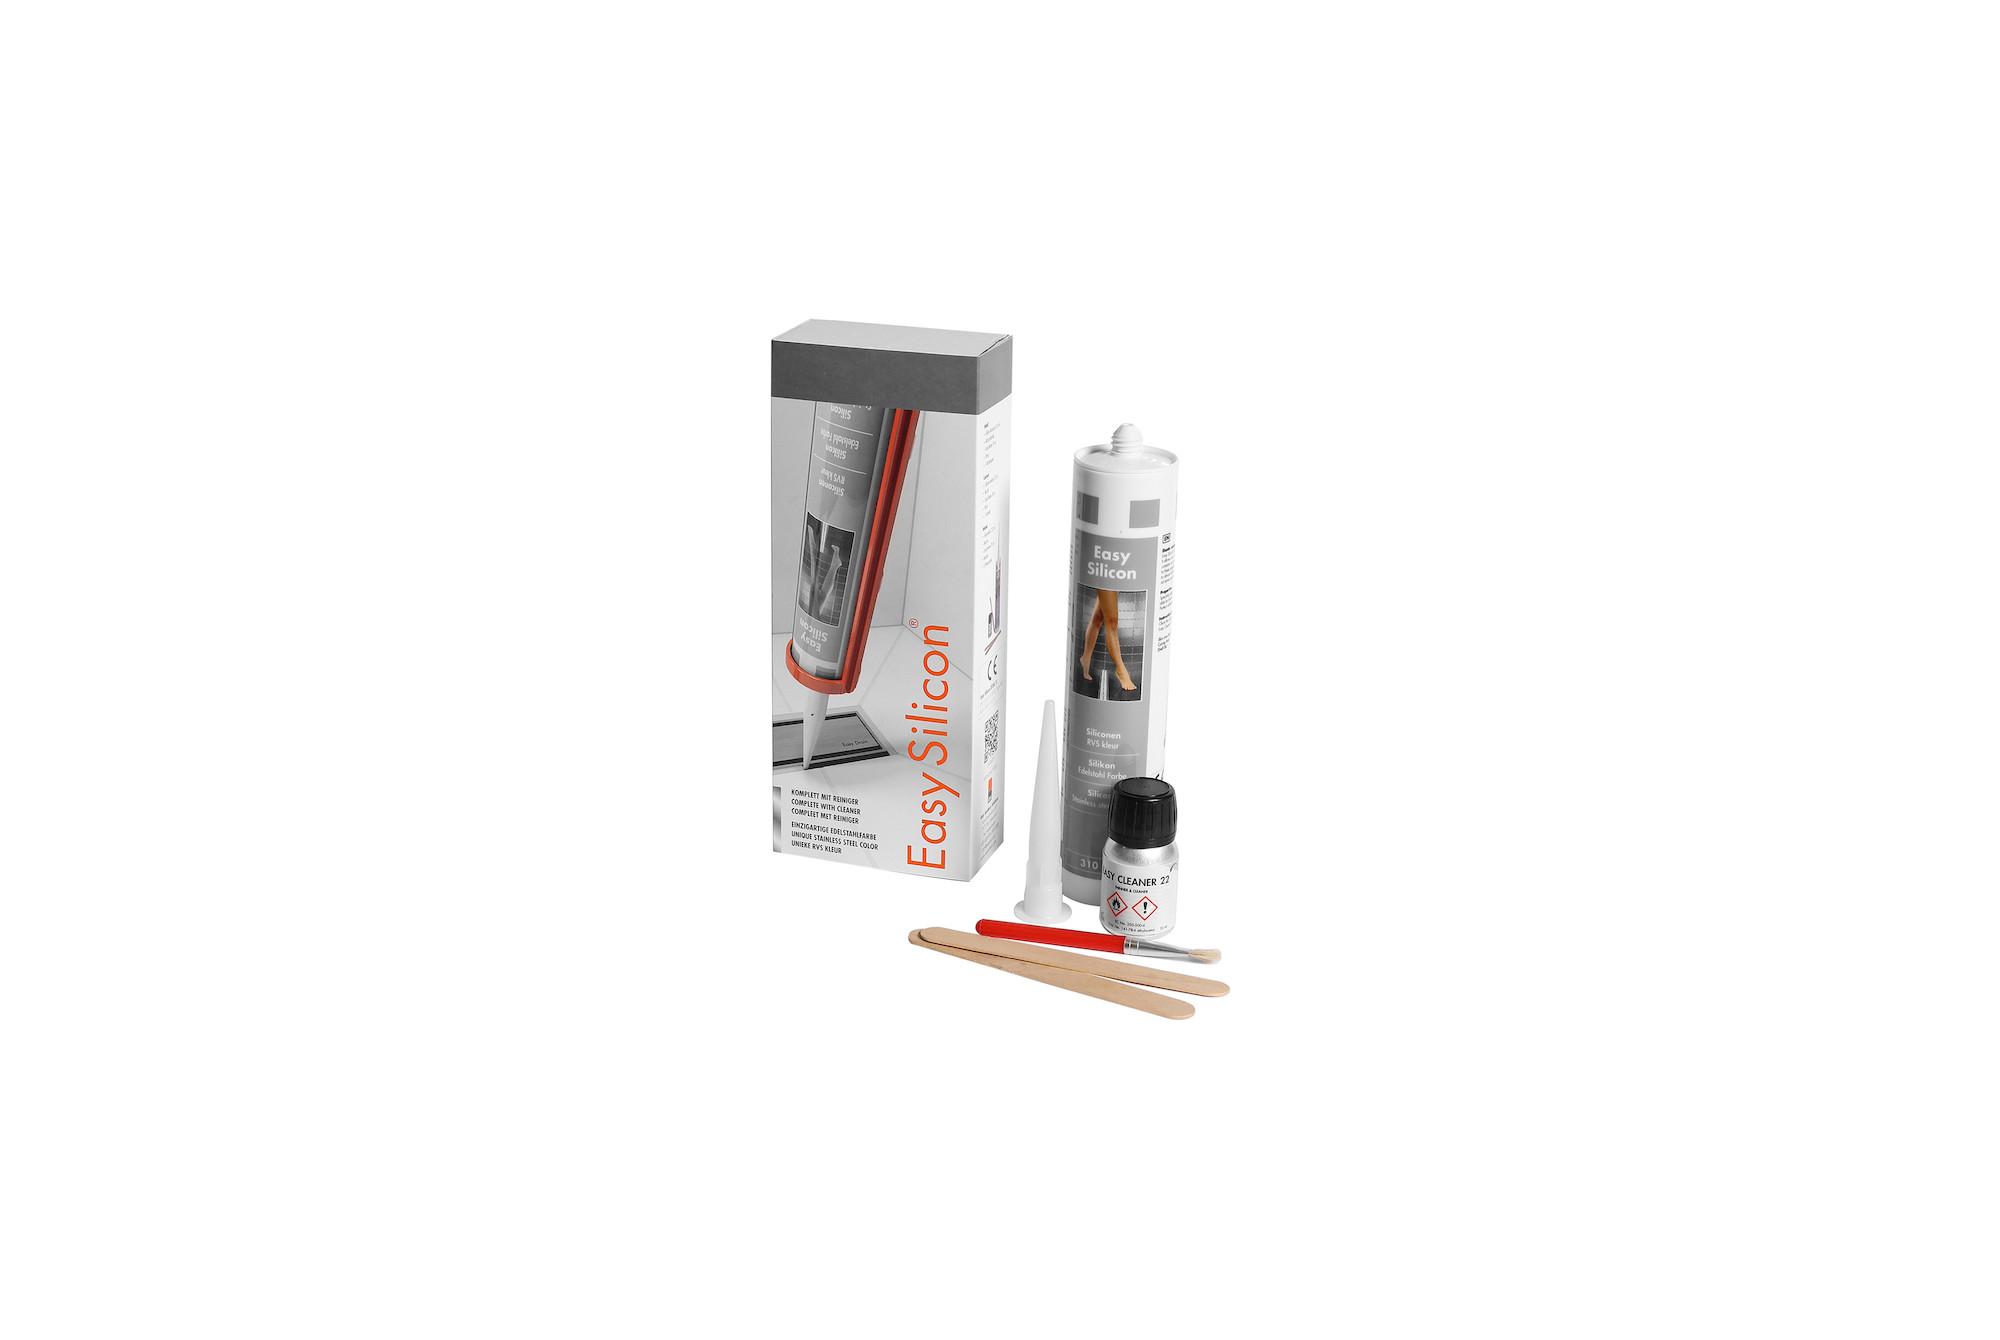 Droogtijd Siliconenkit Badkamer : Easy silicon rvs kleur easy drain